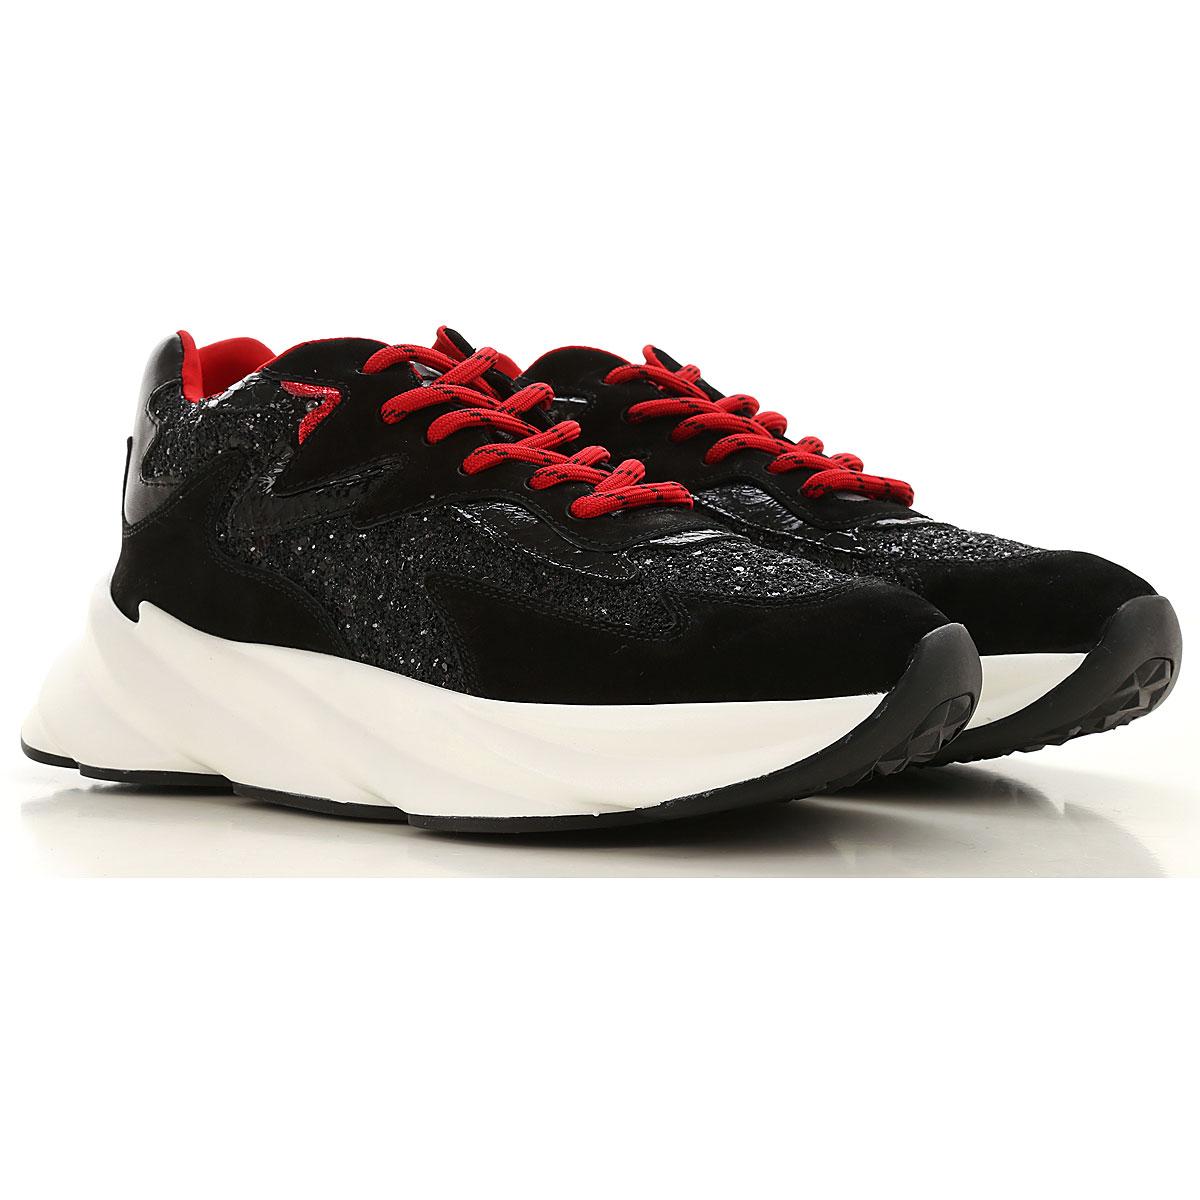 Elena Iachi Sneakers for Women On Sale, Black, Leather, 2019, 10 5 6 7 8 9